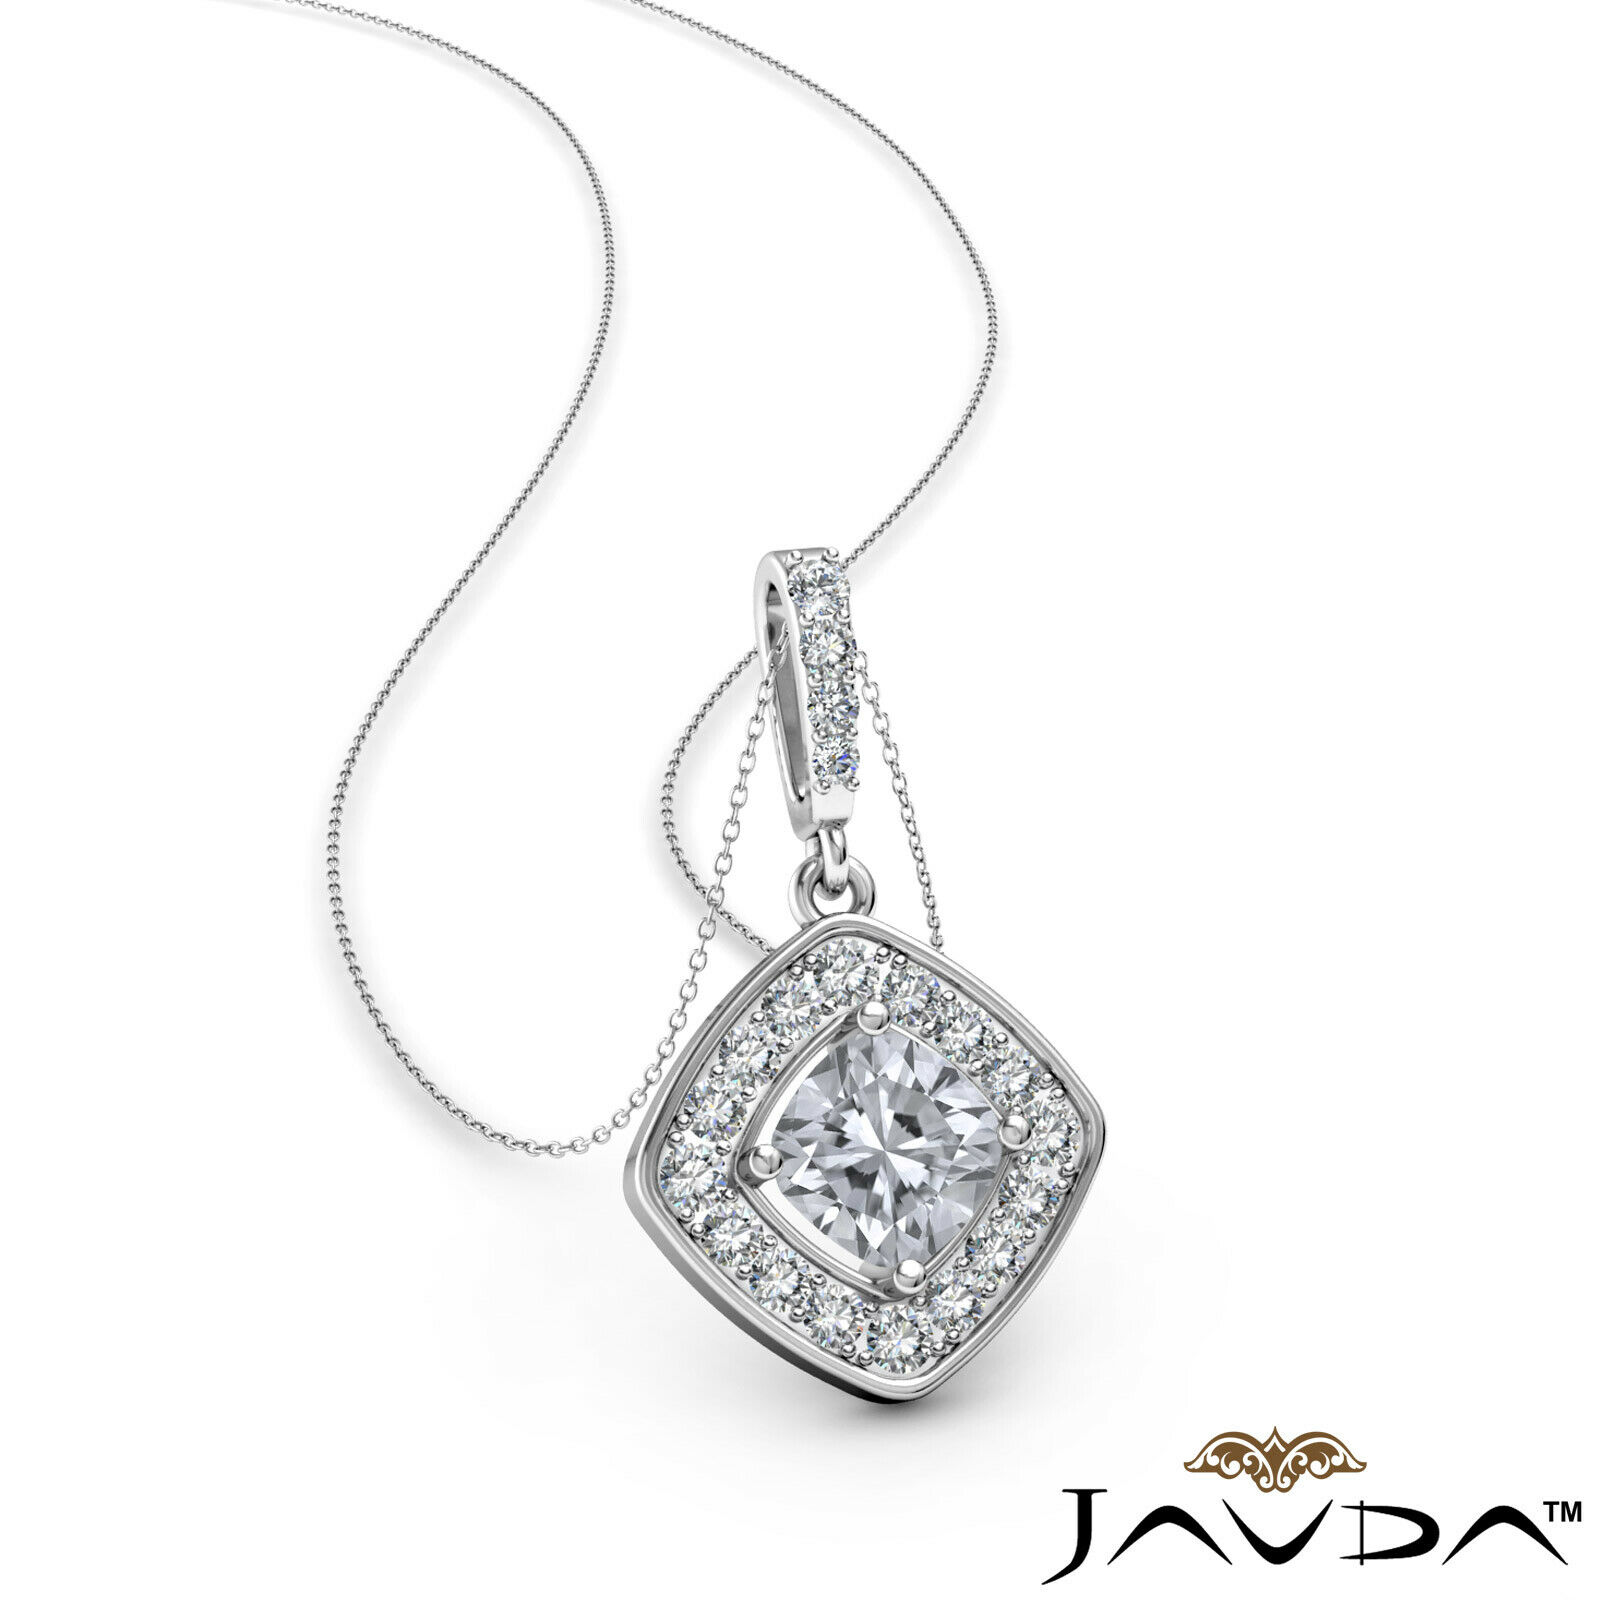 100% Natural Cushion Diamond Halo Micro Pave Setting Pendant Necklace 0.64ctw